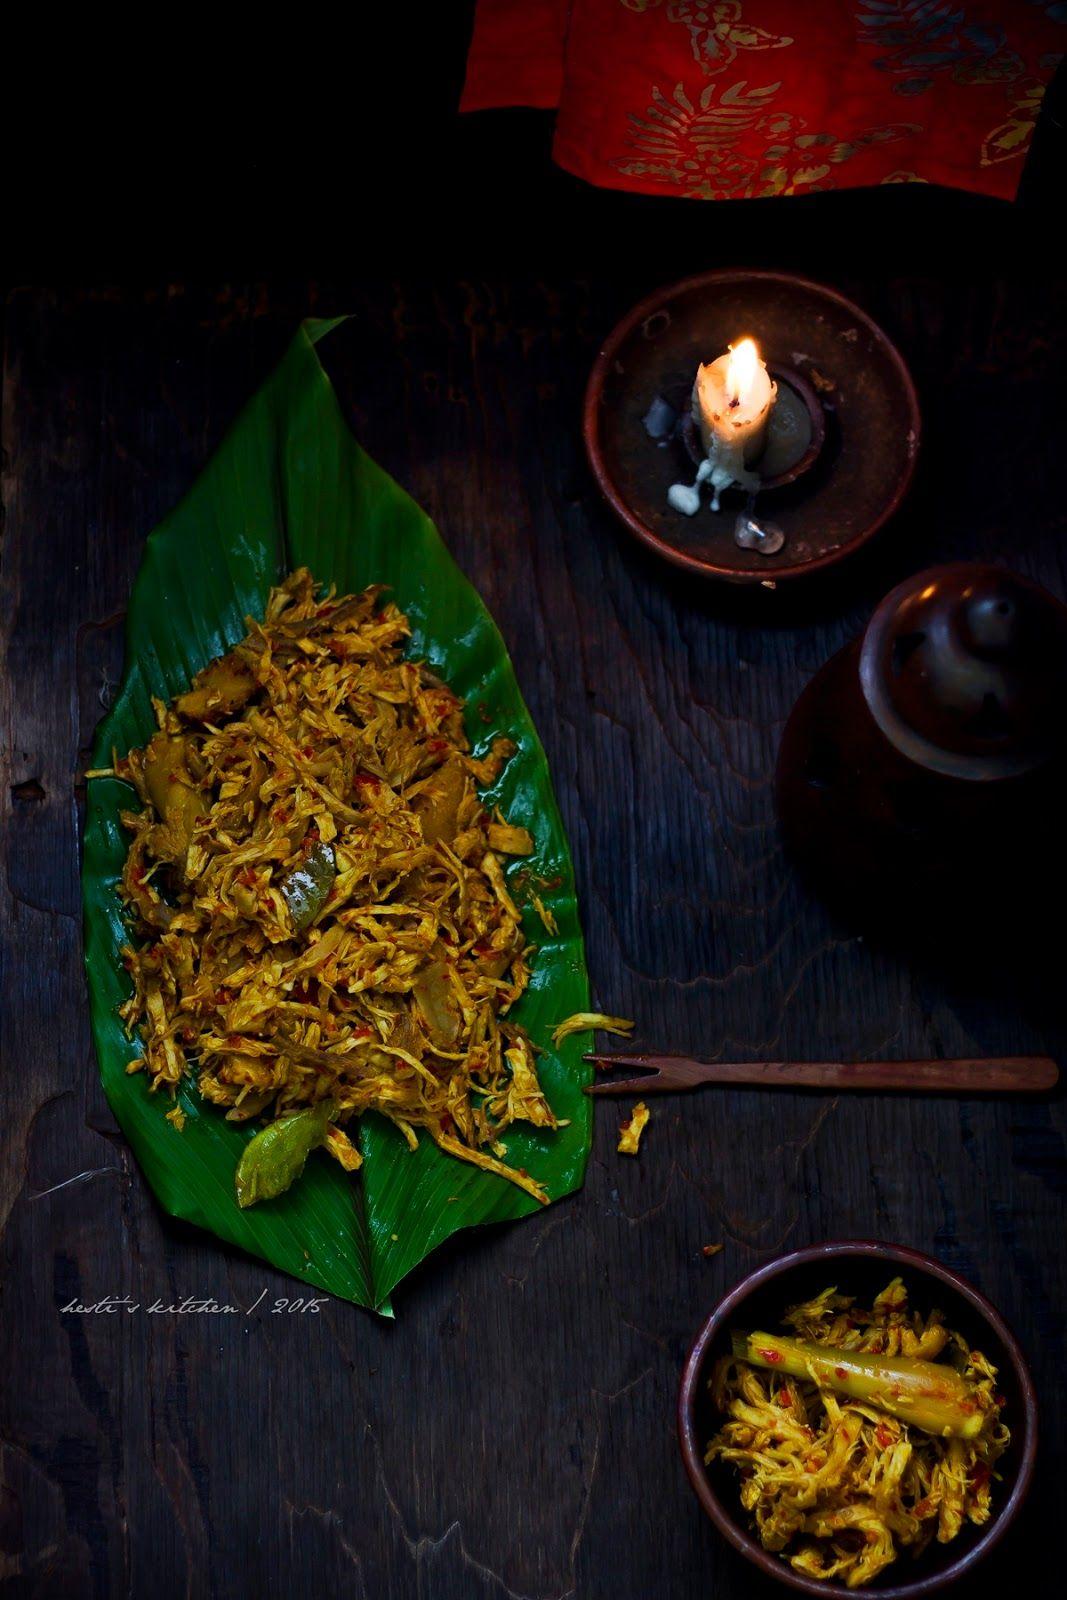 Hesti S Kitchen Yummy For Your Tummy Ayam Suwir Pedas Ala Bali Resep Ayam Suwir Resep Ayam Makanan